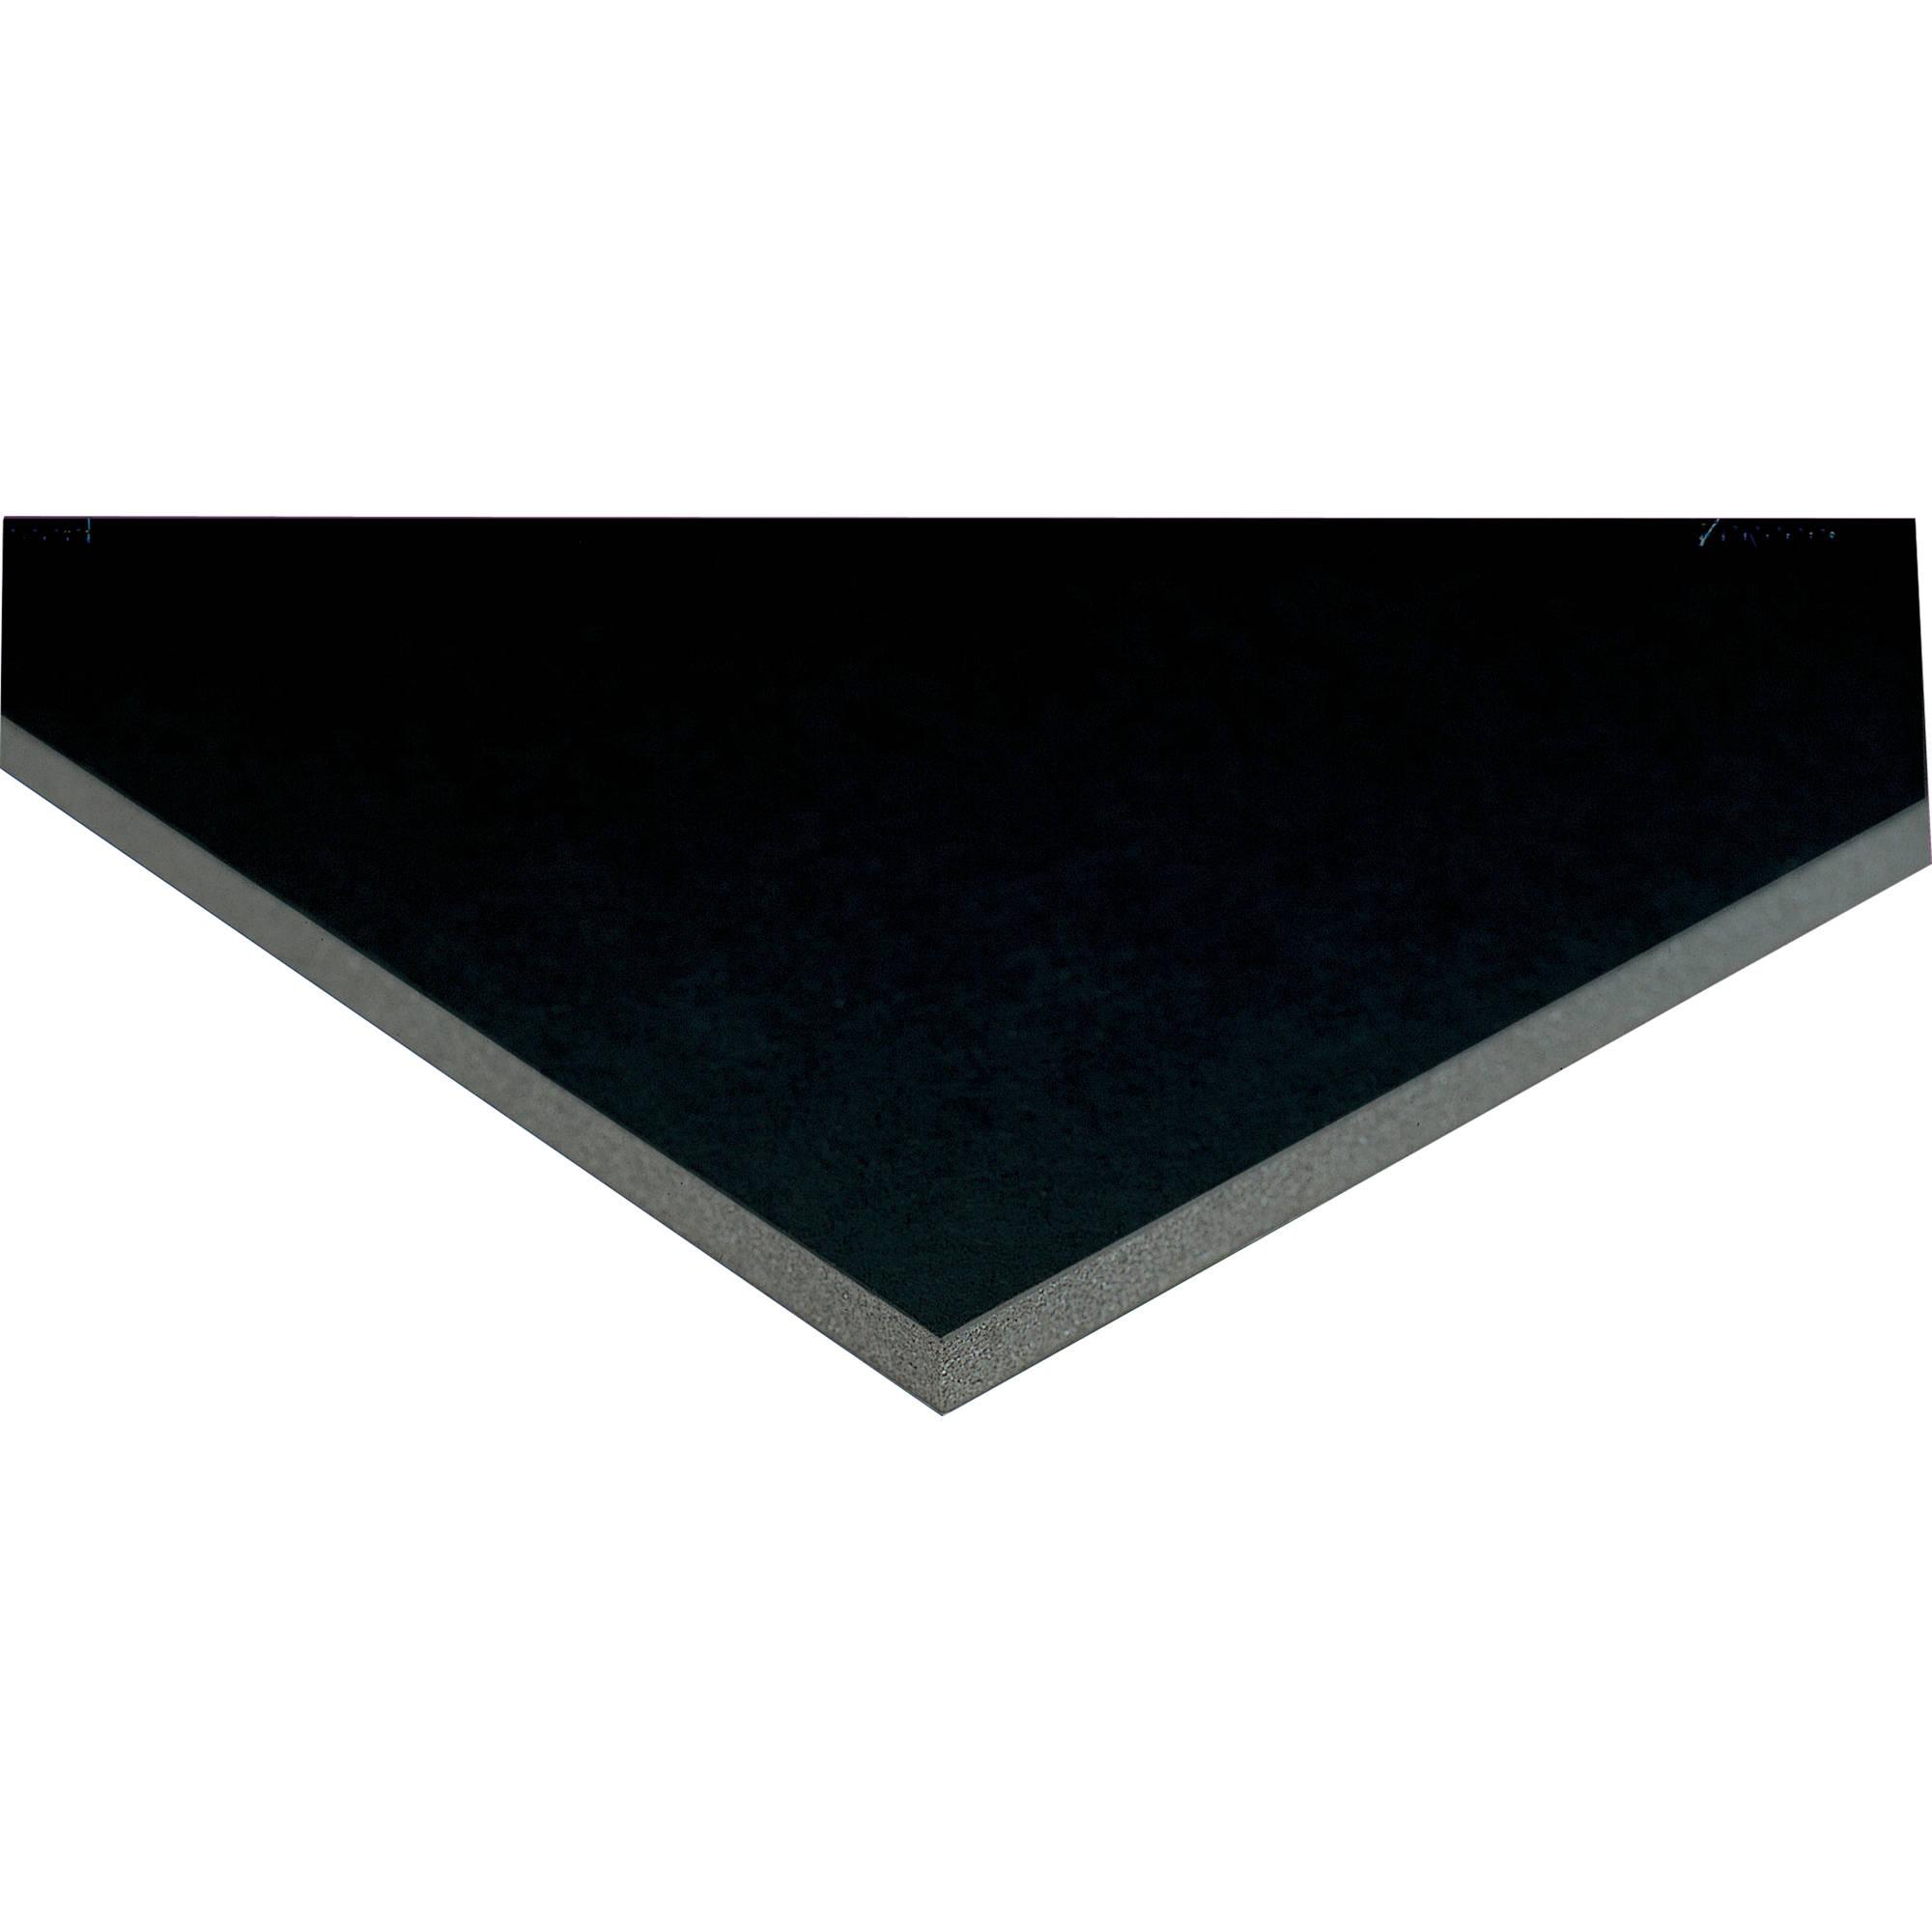 huntington mats close select mat bainbridge board wv productshowroom details out view ply international moulding crescent